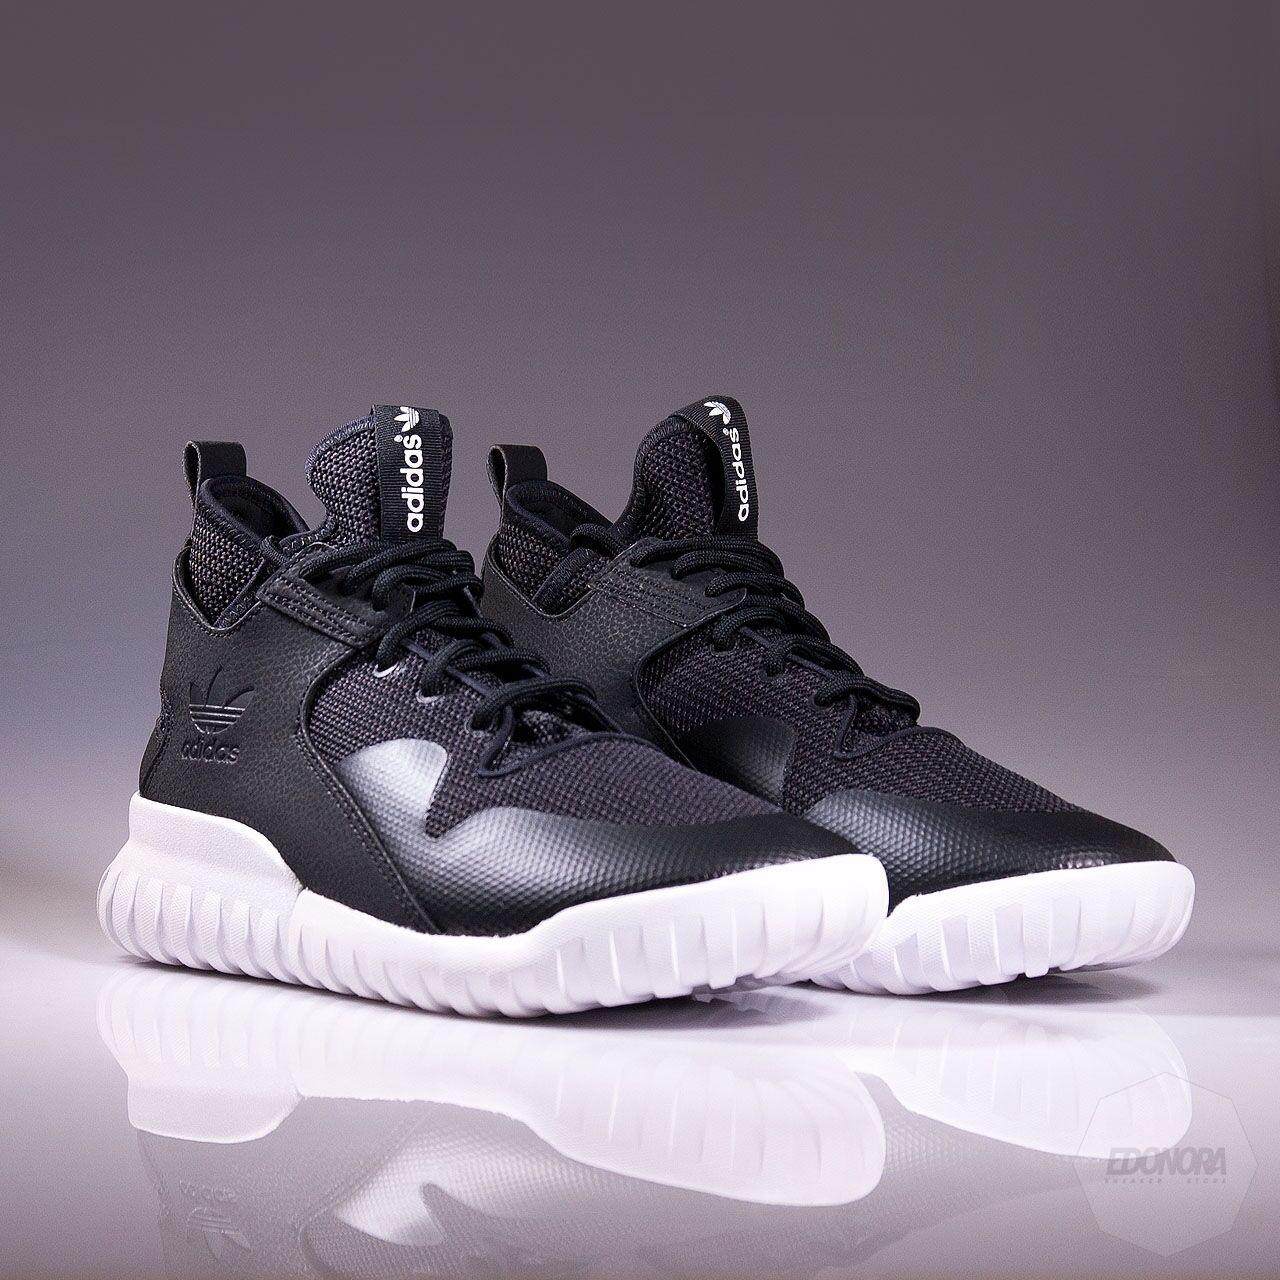 7086a5bfc ADIDAS ORIGINALS TUBULAR X GREY GUM AQ5403 SIZE 10.5 Yeezy Mens Shoes ICE  Sole 70%